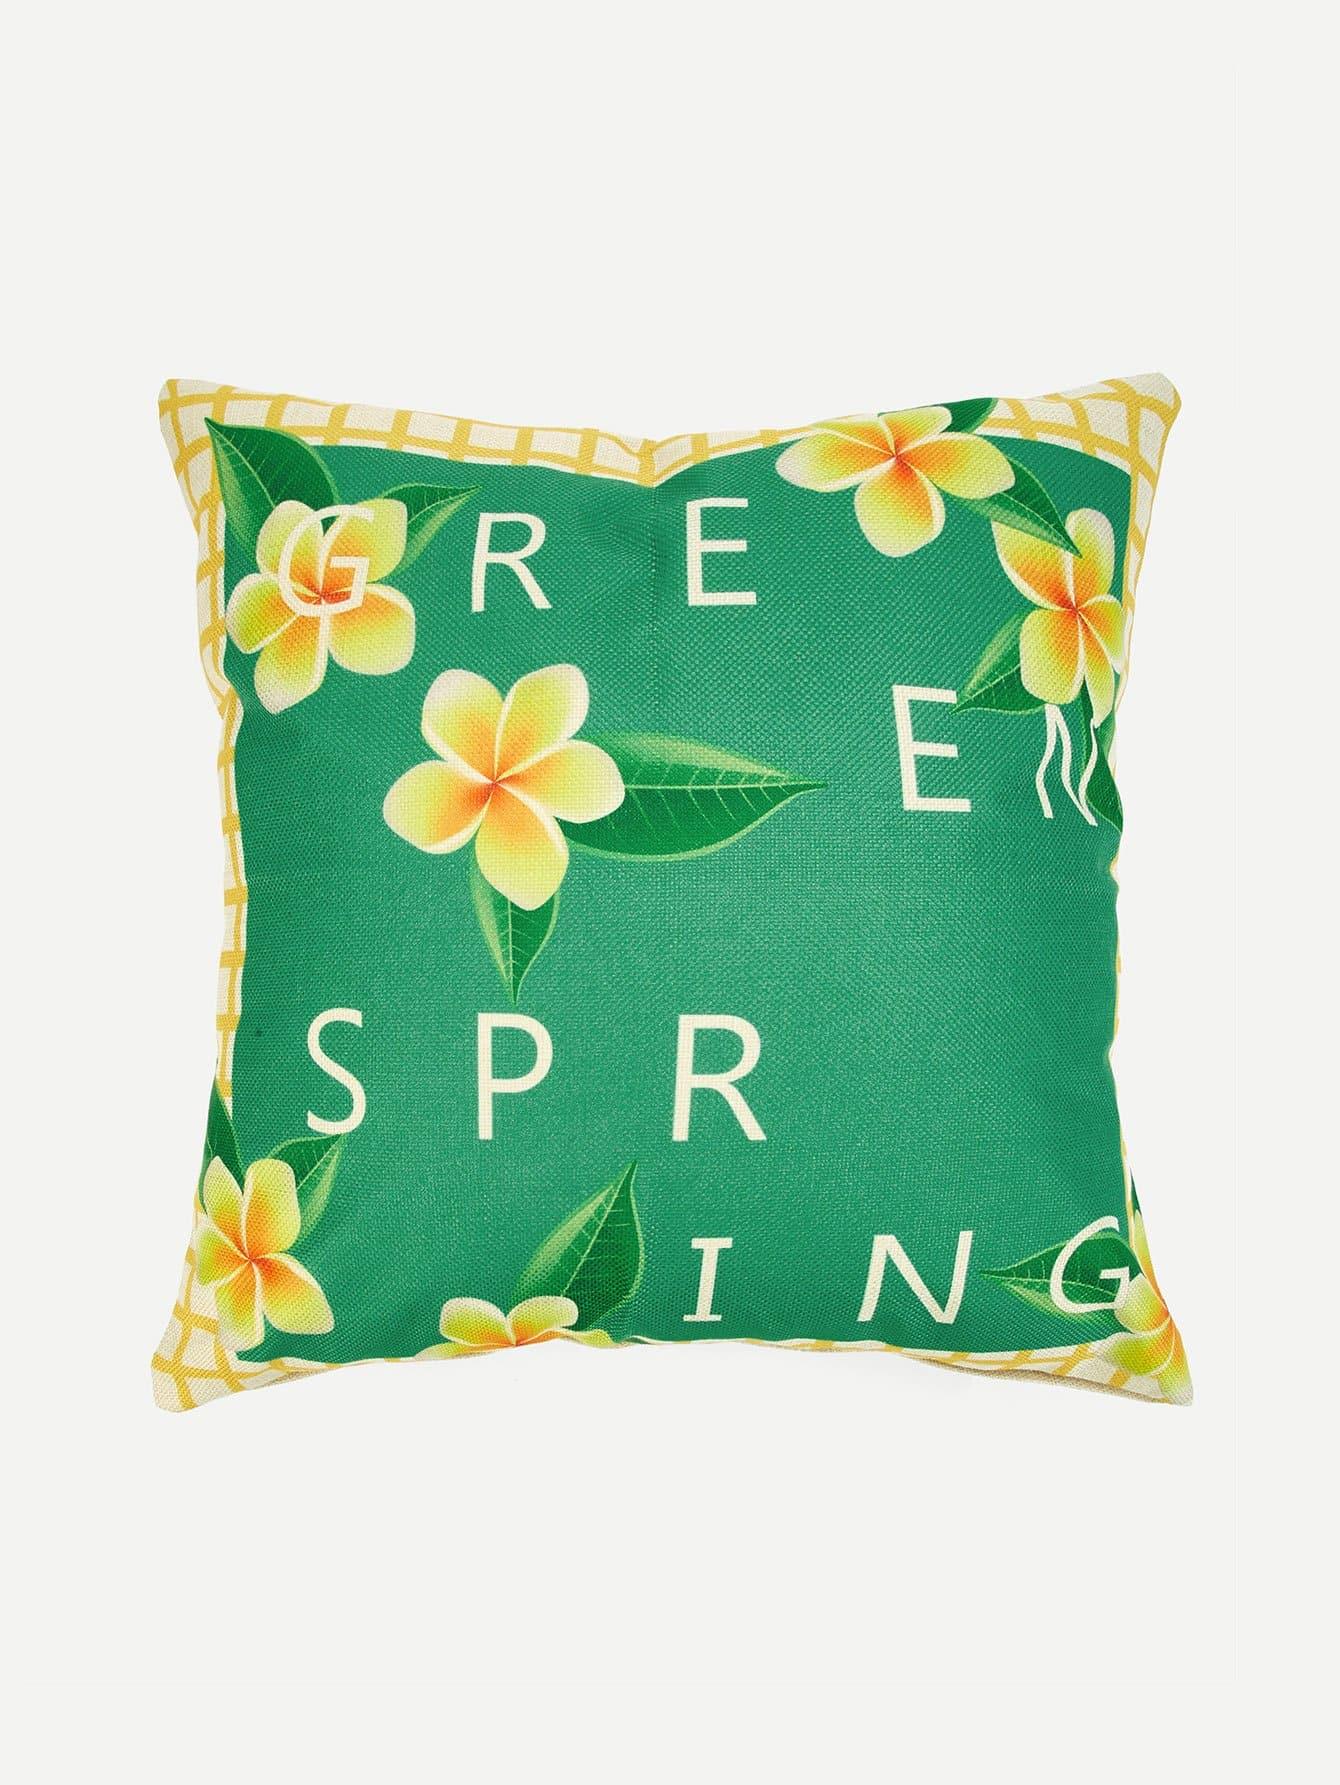 Flower & Letter Pillow Case Cover 1PC